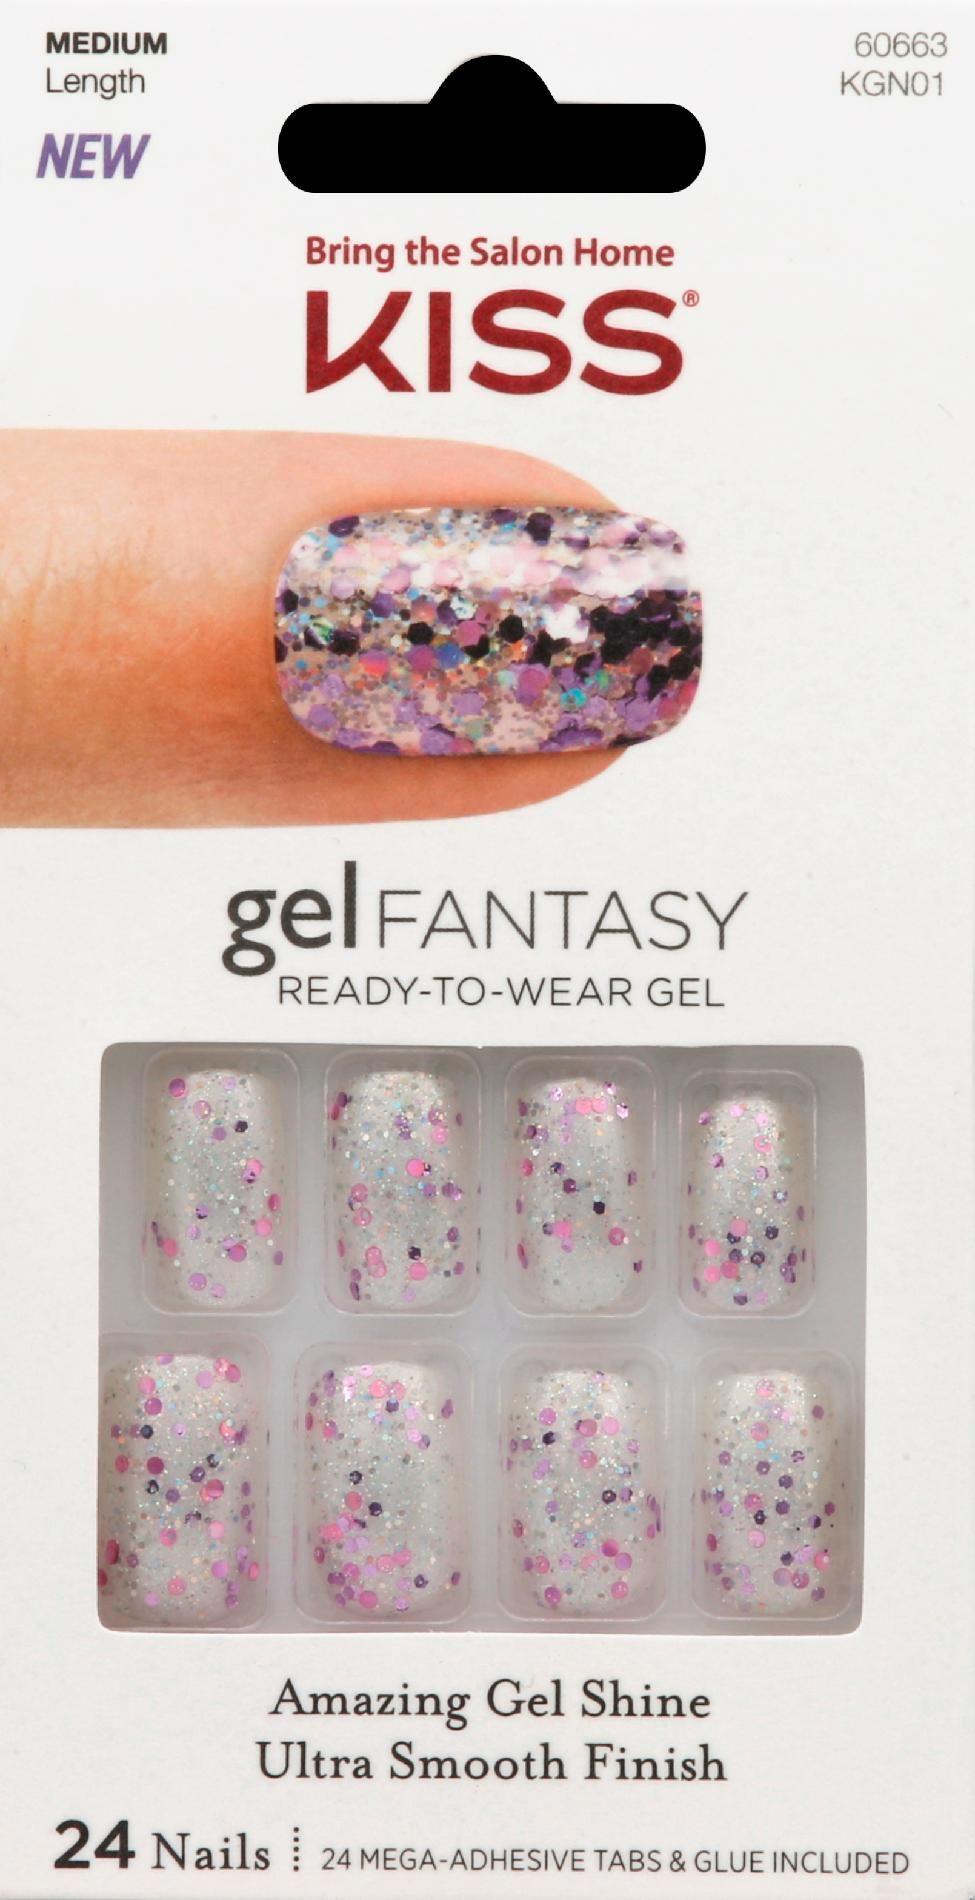 Kiss Gel Fantasy Nail Fanciful 24 Ct Multi Color Kiss Gel Fantasy Nails Gel Fantasy Nails Fantasy Nails